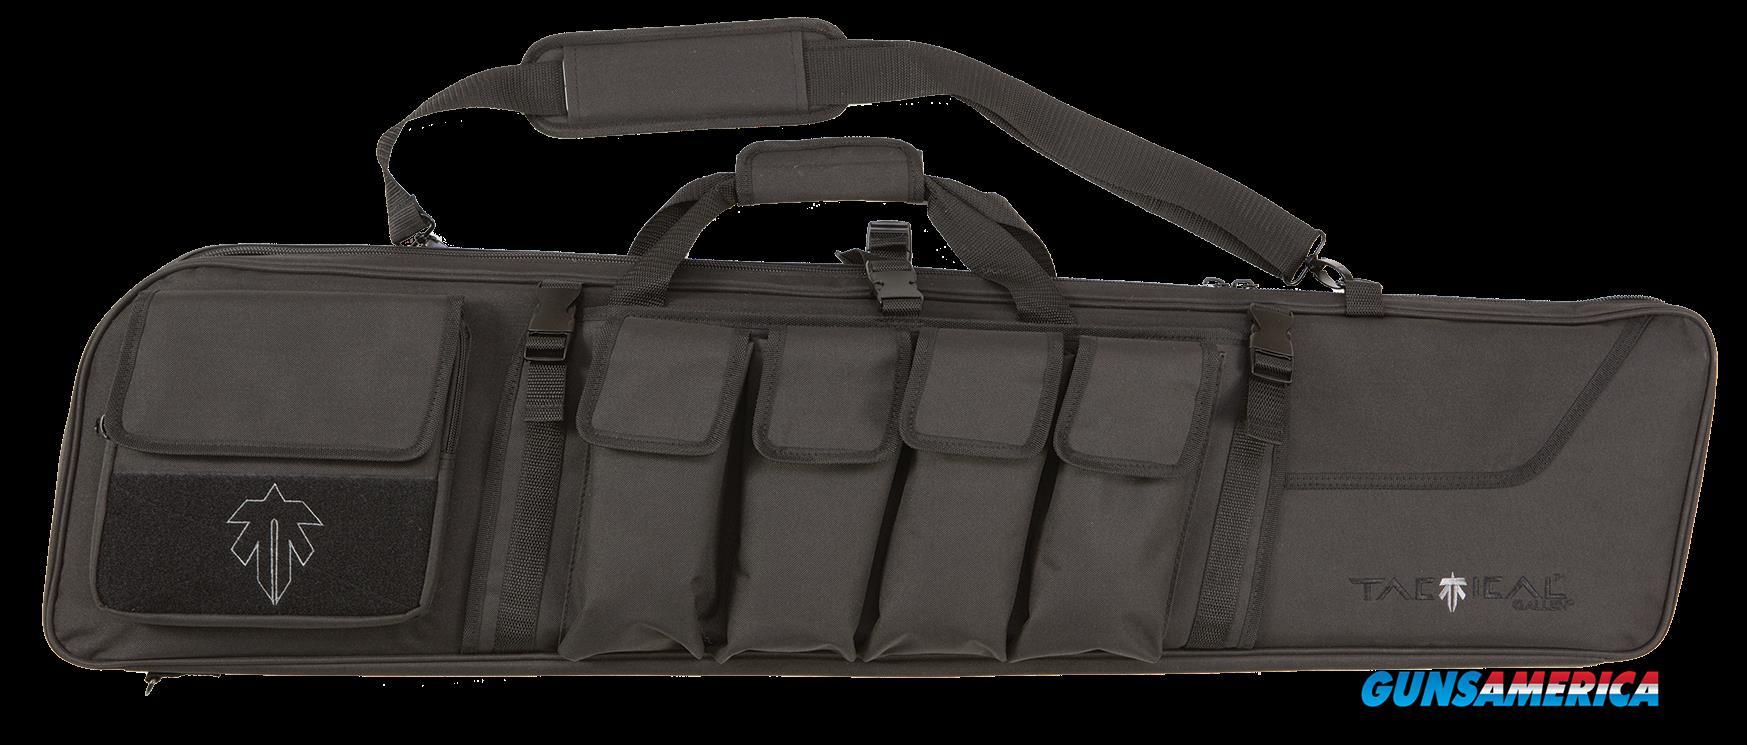 Allen Gear Fit, Allen 10920 Operator Gear Fit Tact Rfl Case 44 Blk  Guns > Pistols > 1911 Pistol Copies (non-Colt)